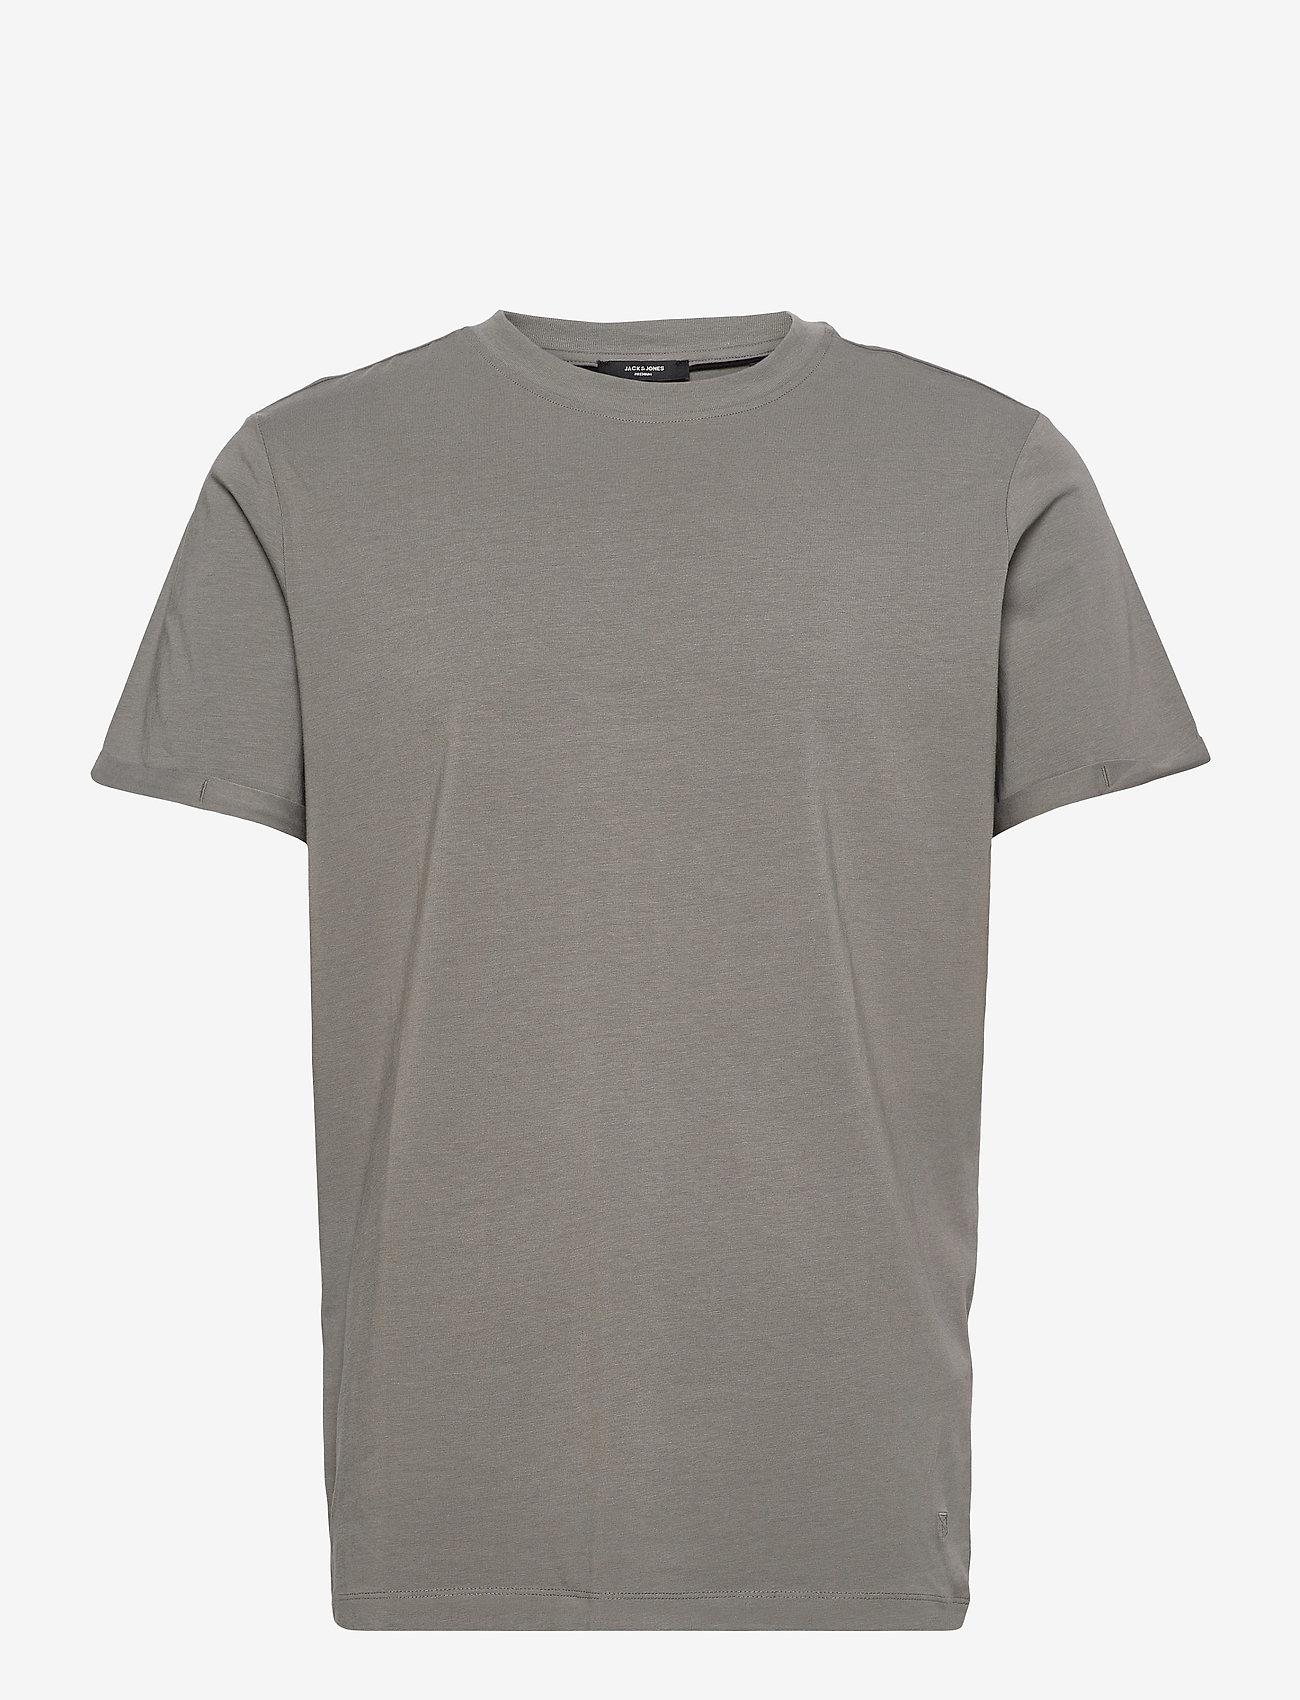 Jack & Jones - JPRBLALOGO SPRING TEE SS CREW NECK - basic t-shirts - new sage - 0